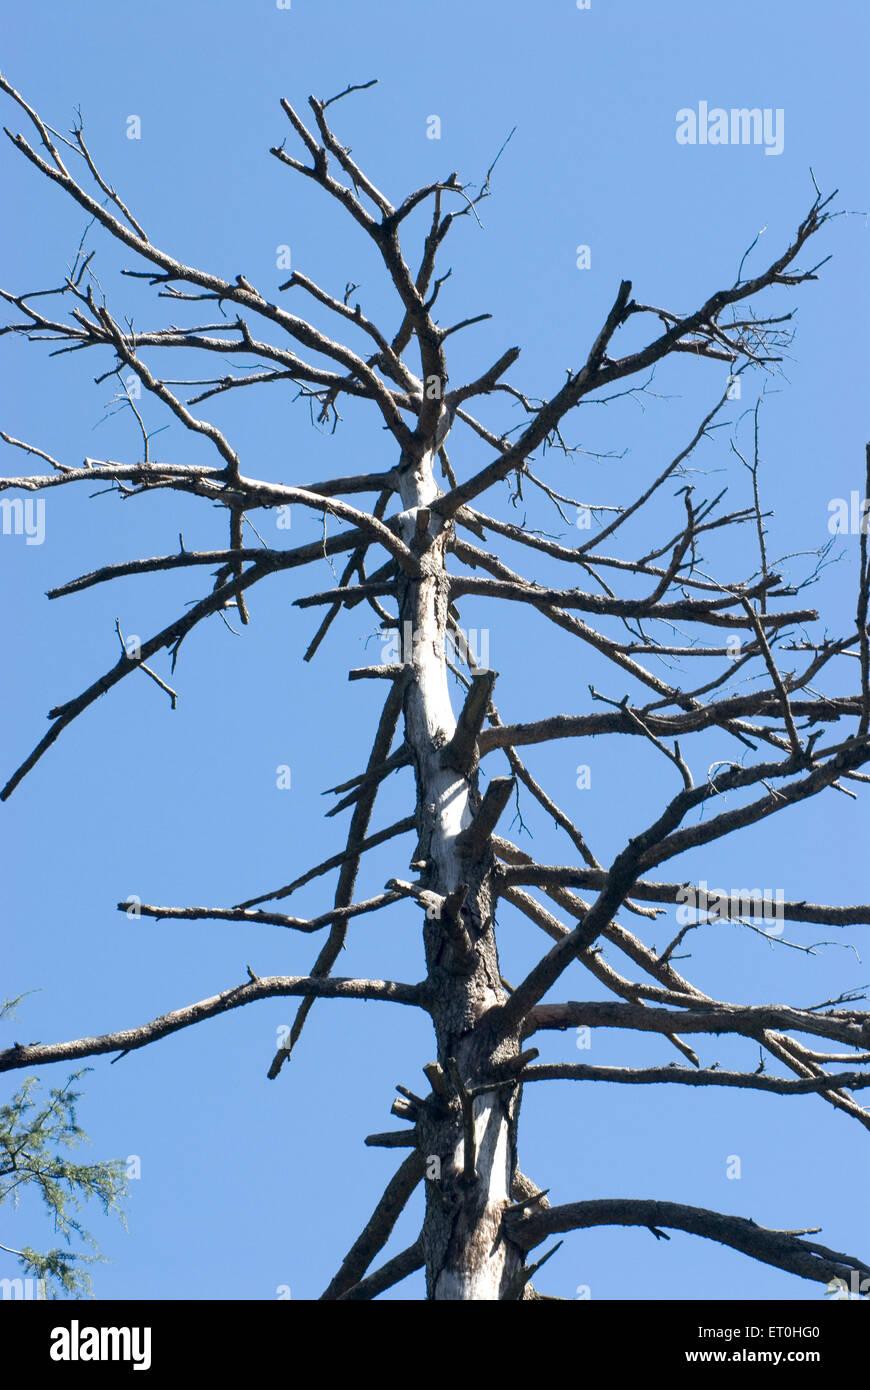 Silver birch tree without leaf at khajjair ; Himachal Pradesh ; India - Stock Image